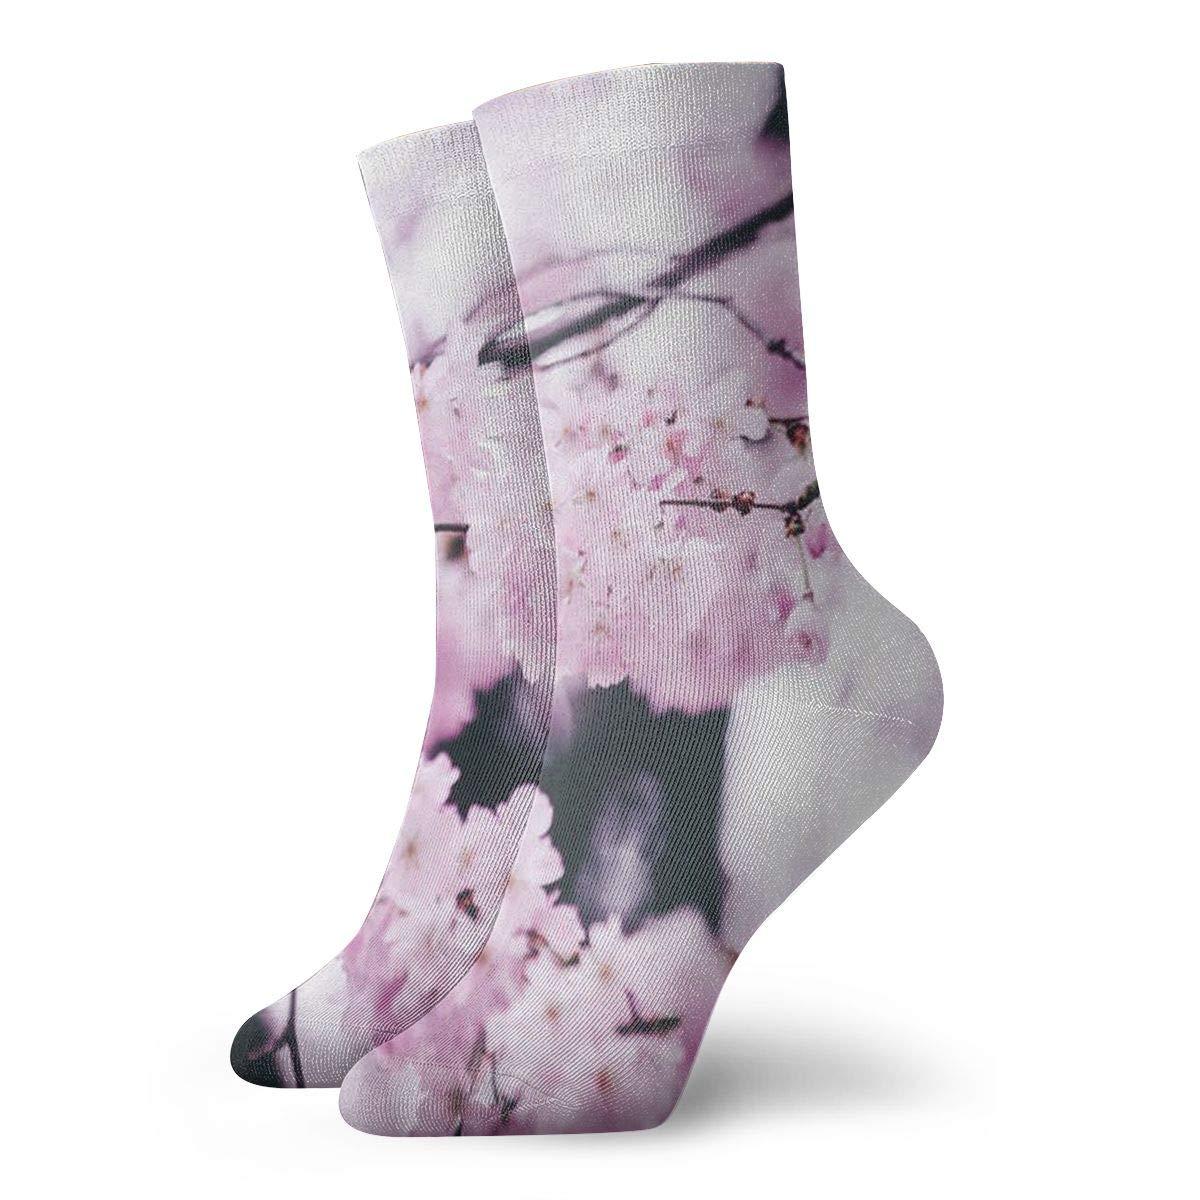 Sakura Unisex Funny Casual Crew Socks Athletic Socks For Boys Girls Kids Teenagers